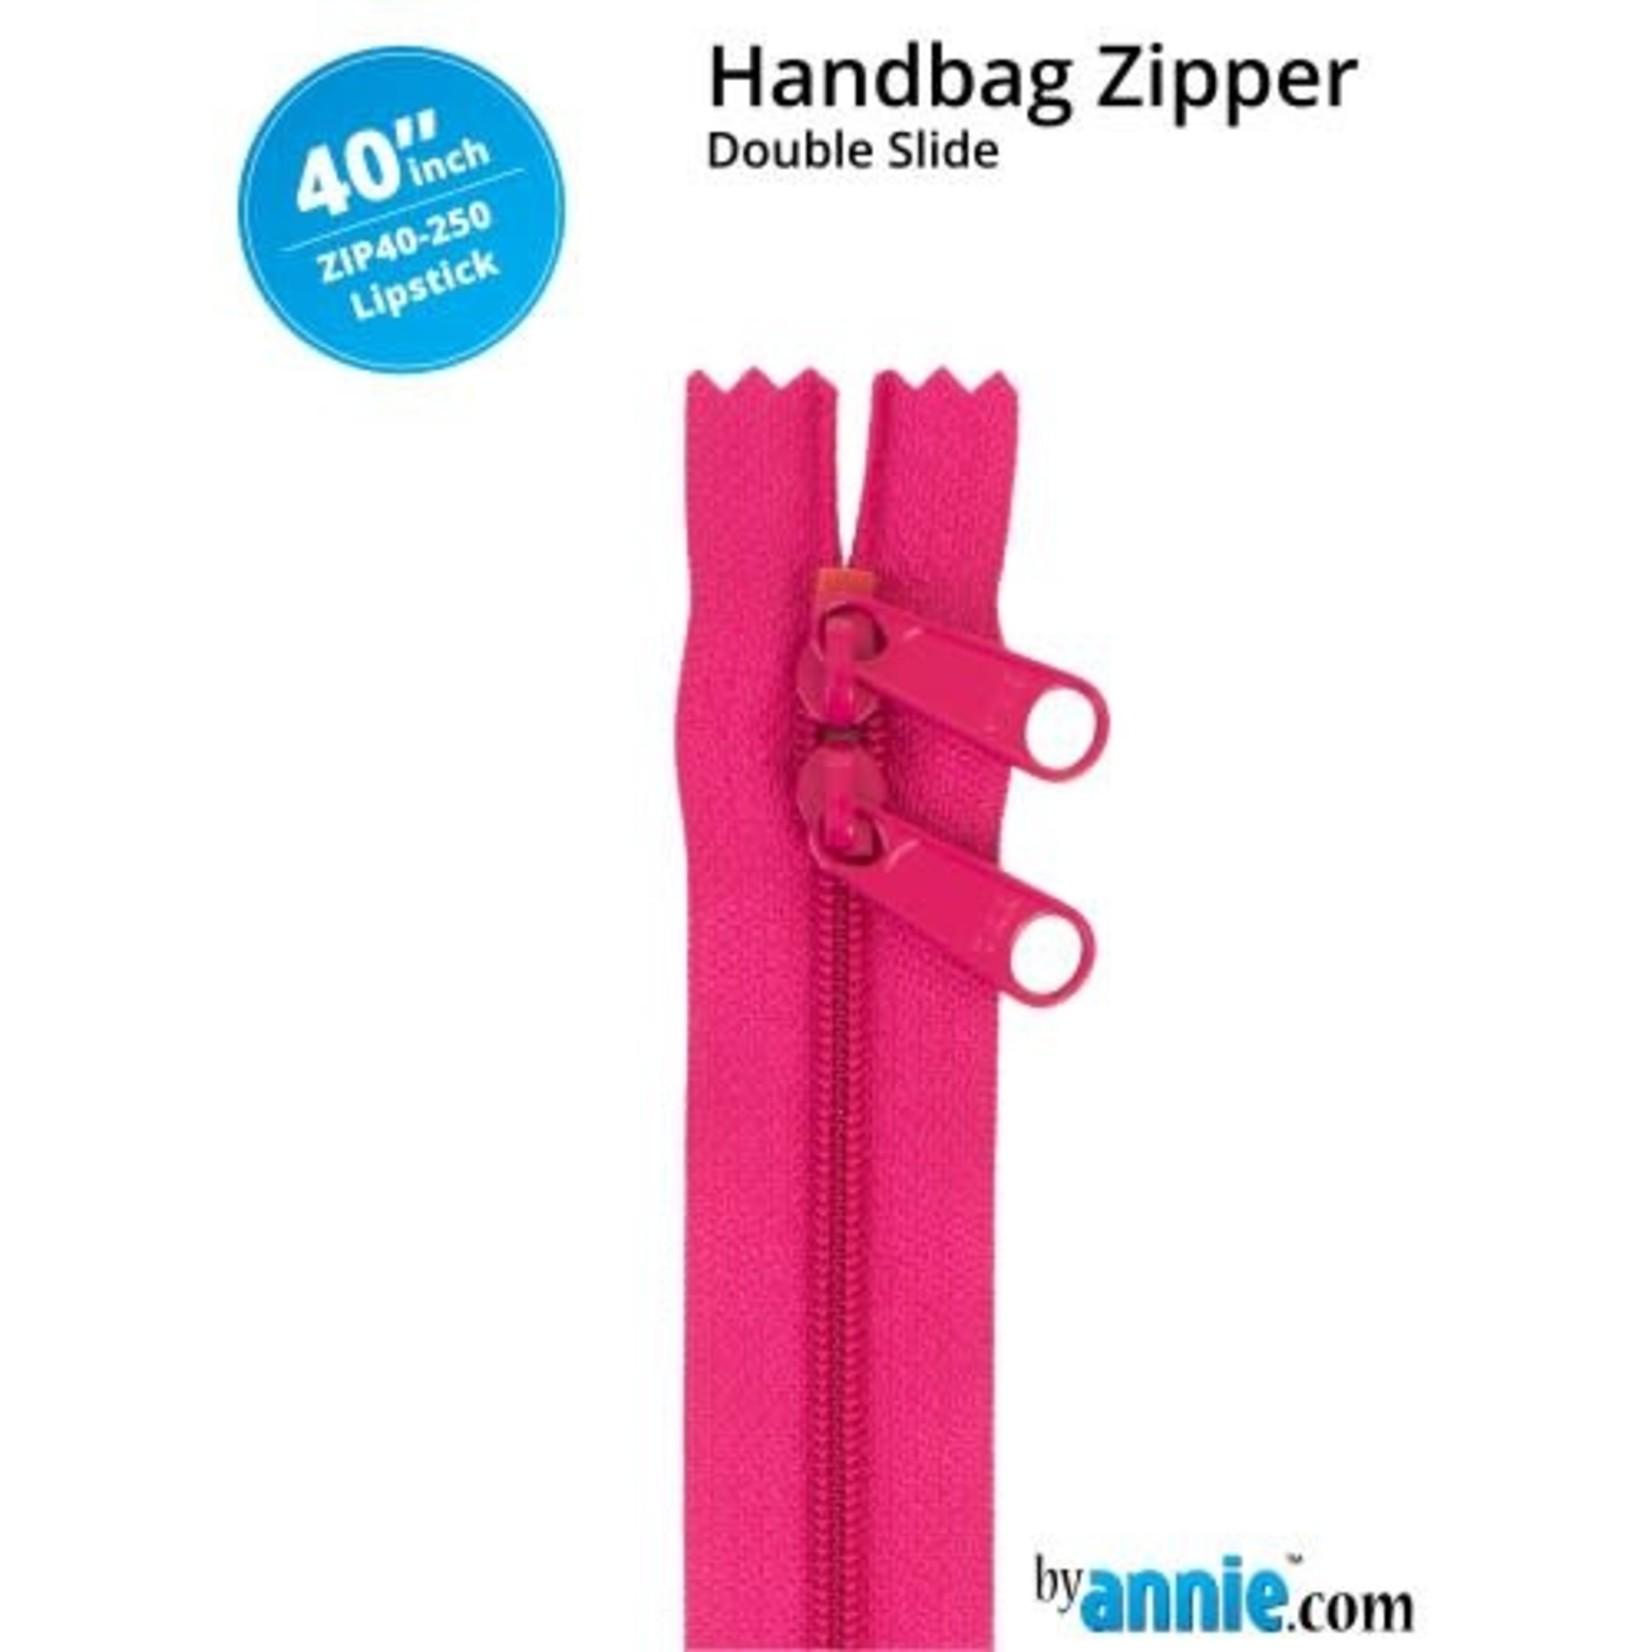 "BY ANNIE Double Slide Handbag Zipper 40"" Red/Pink"